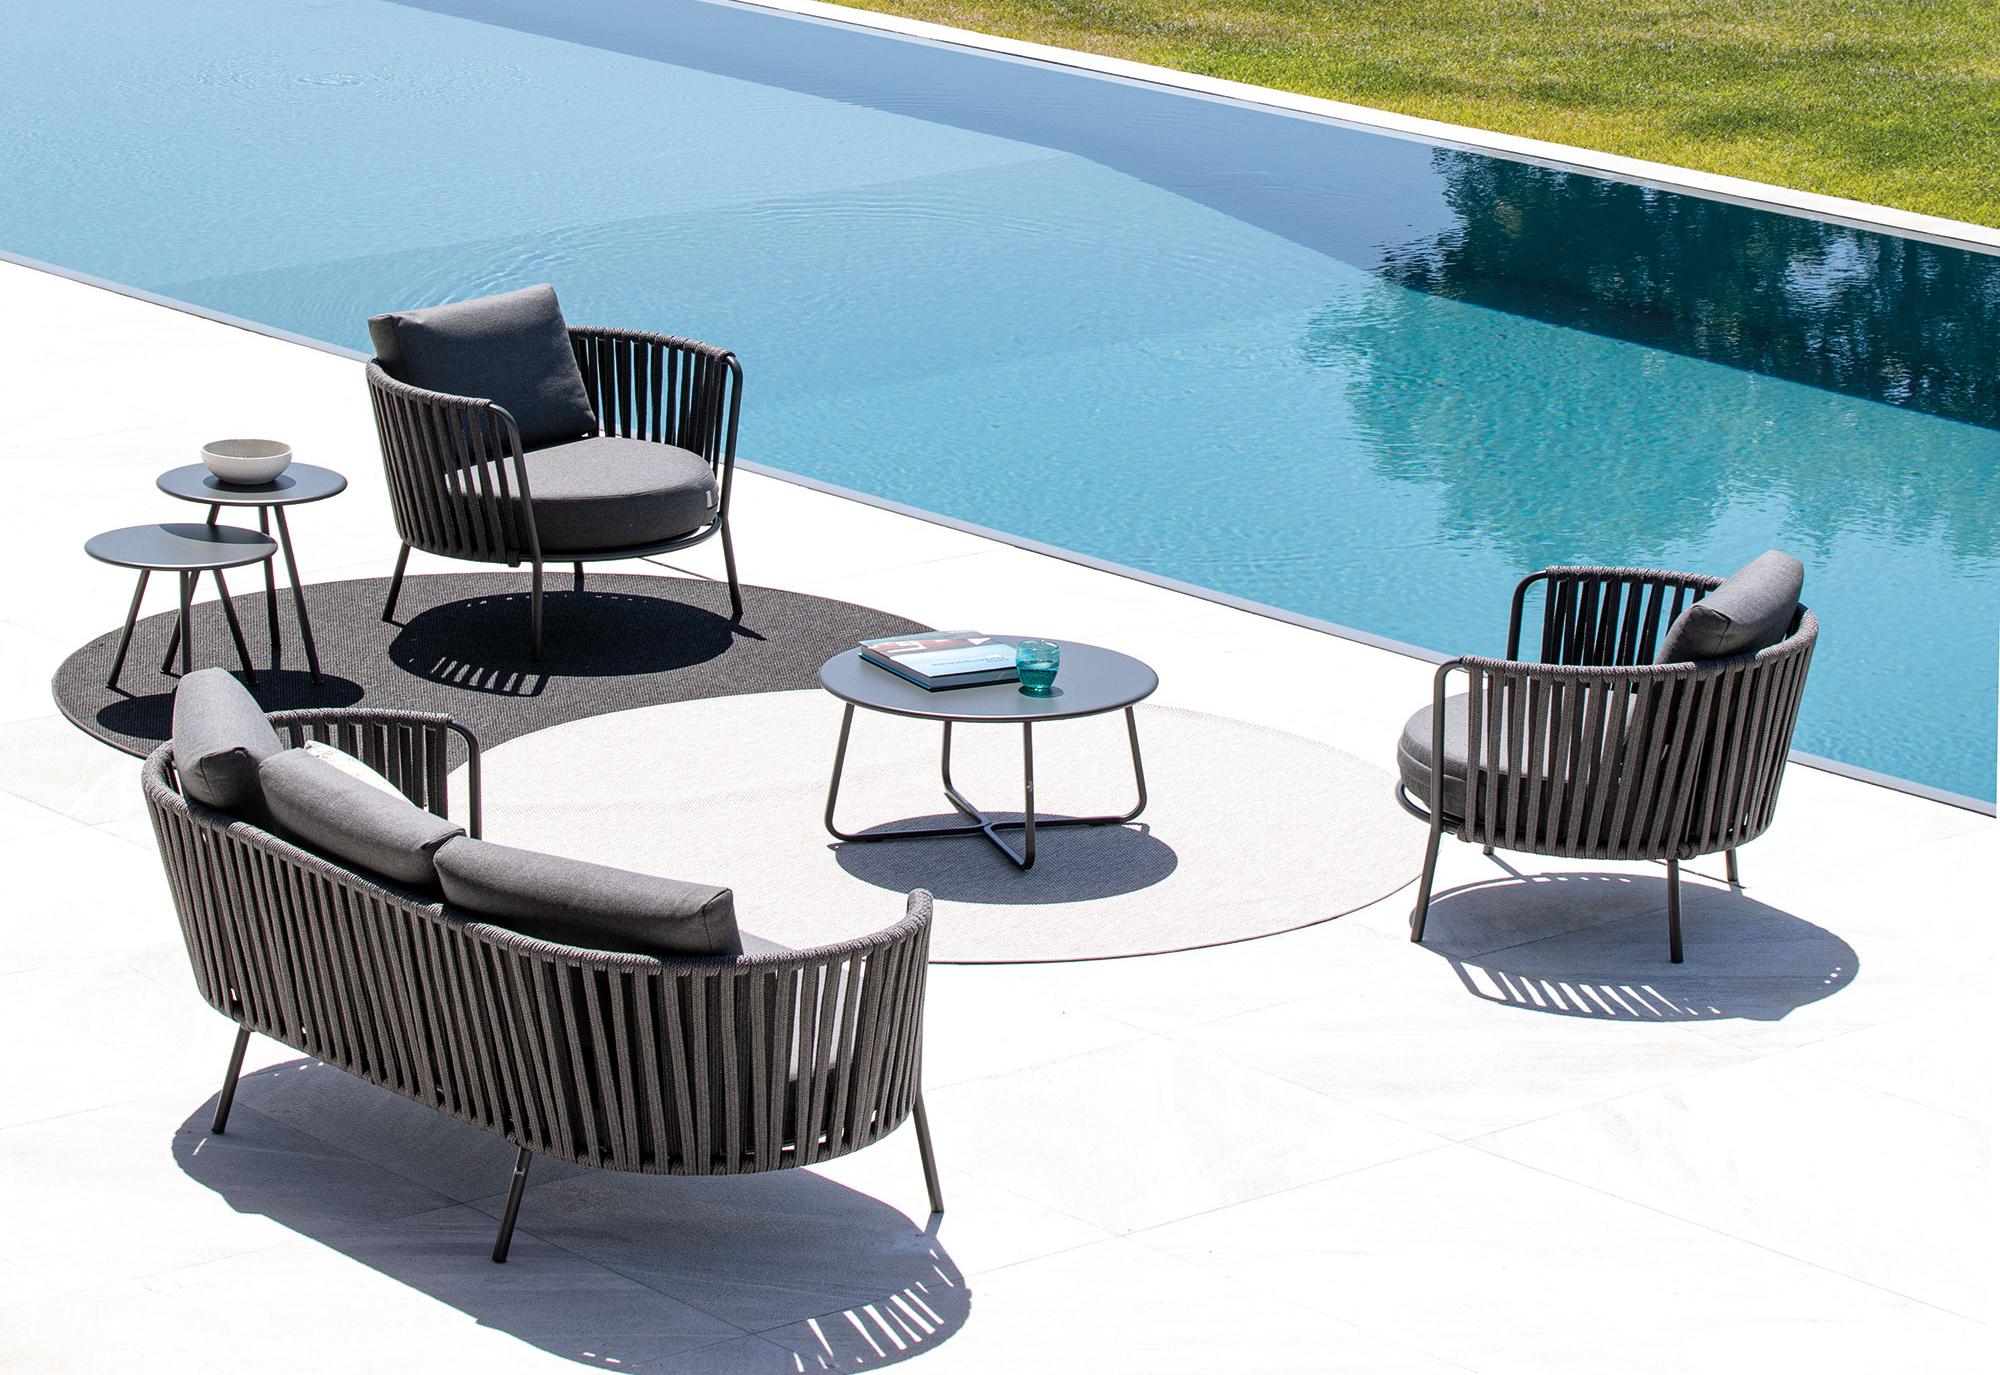 Stunning mobili da giardino on line pictures for Arredo giardino on line offerte